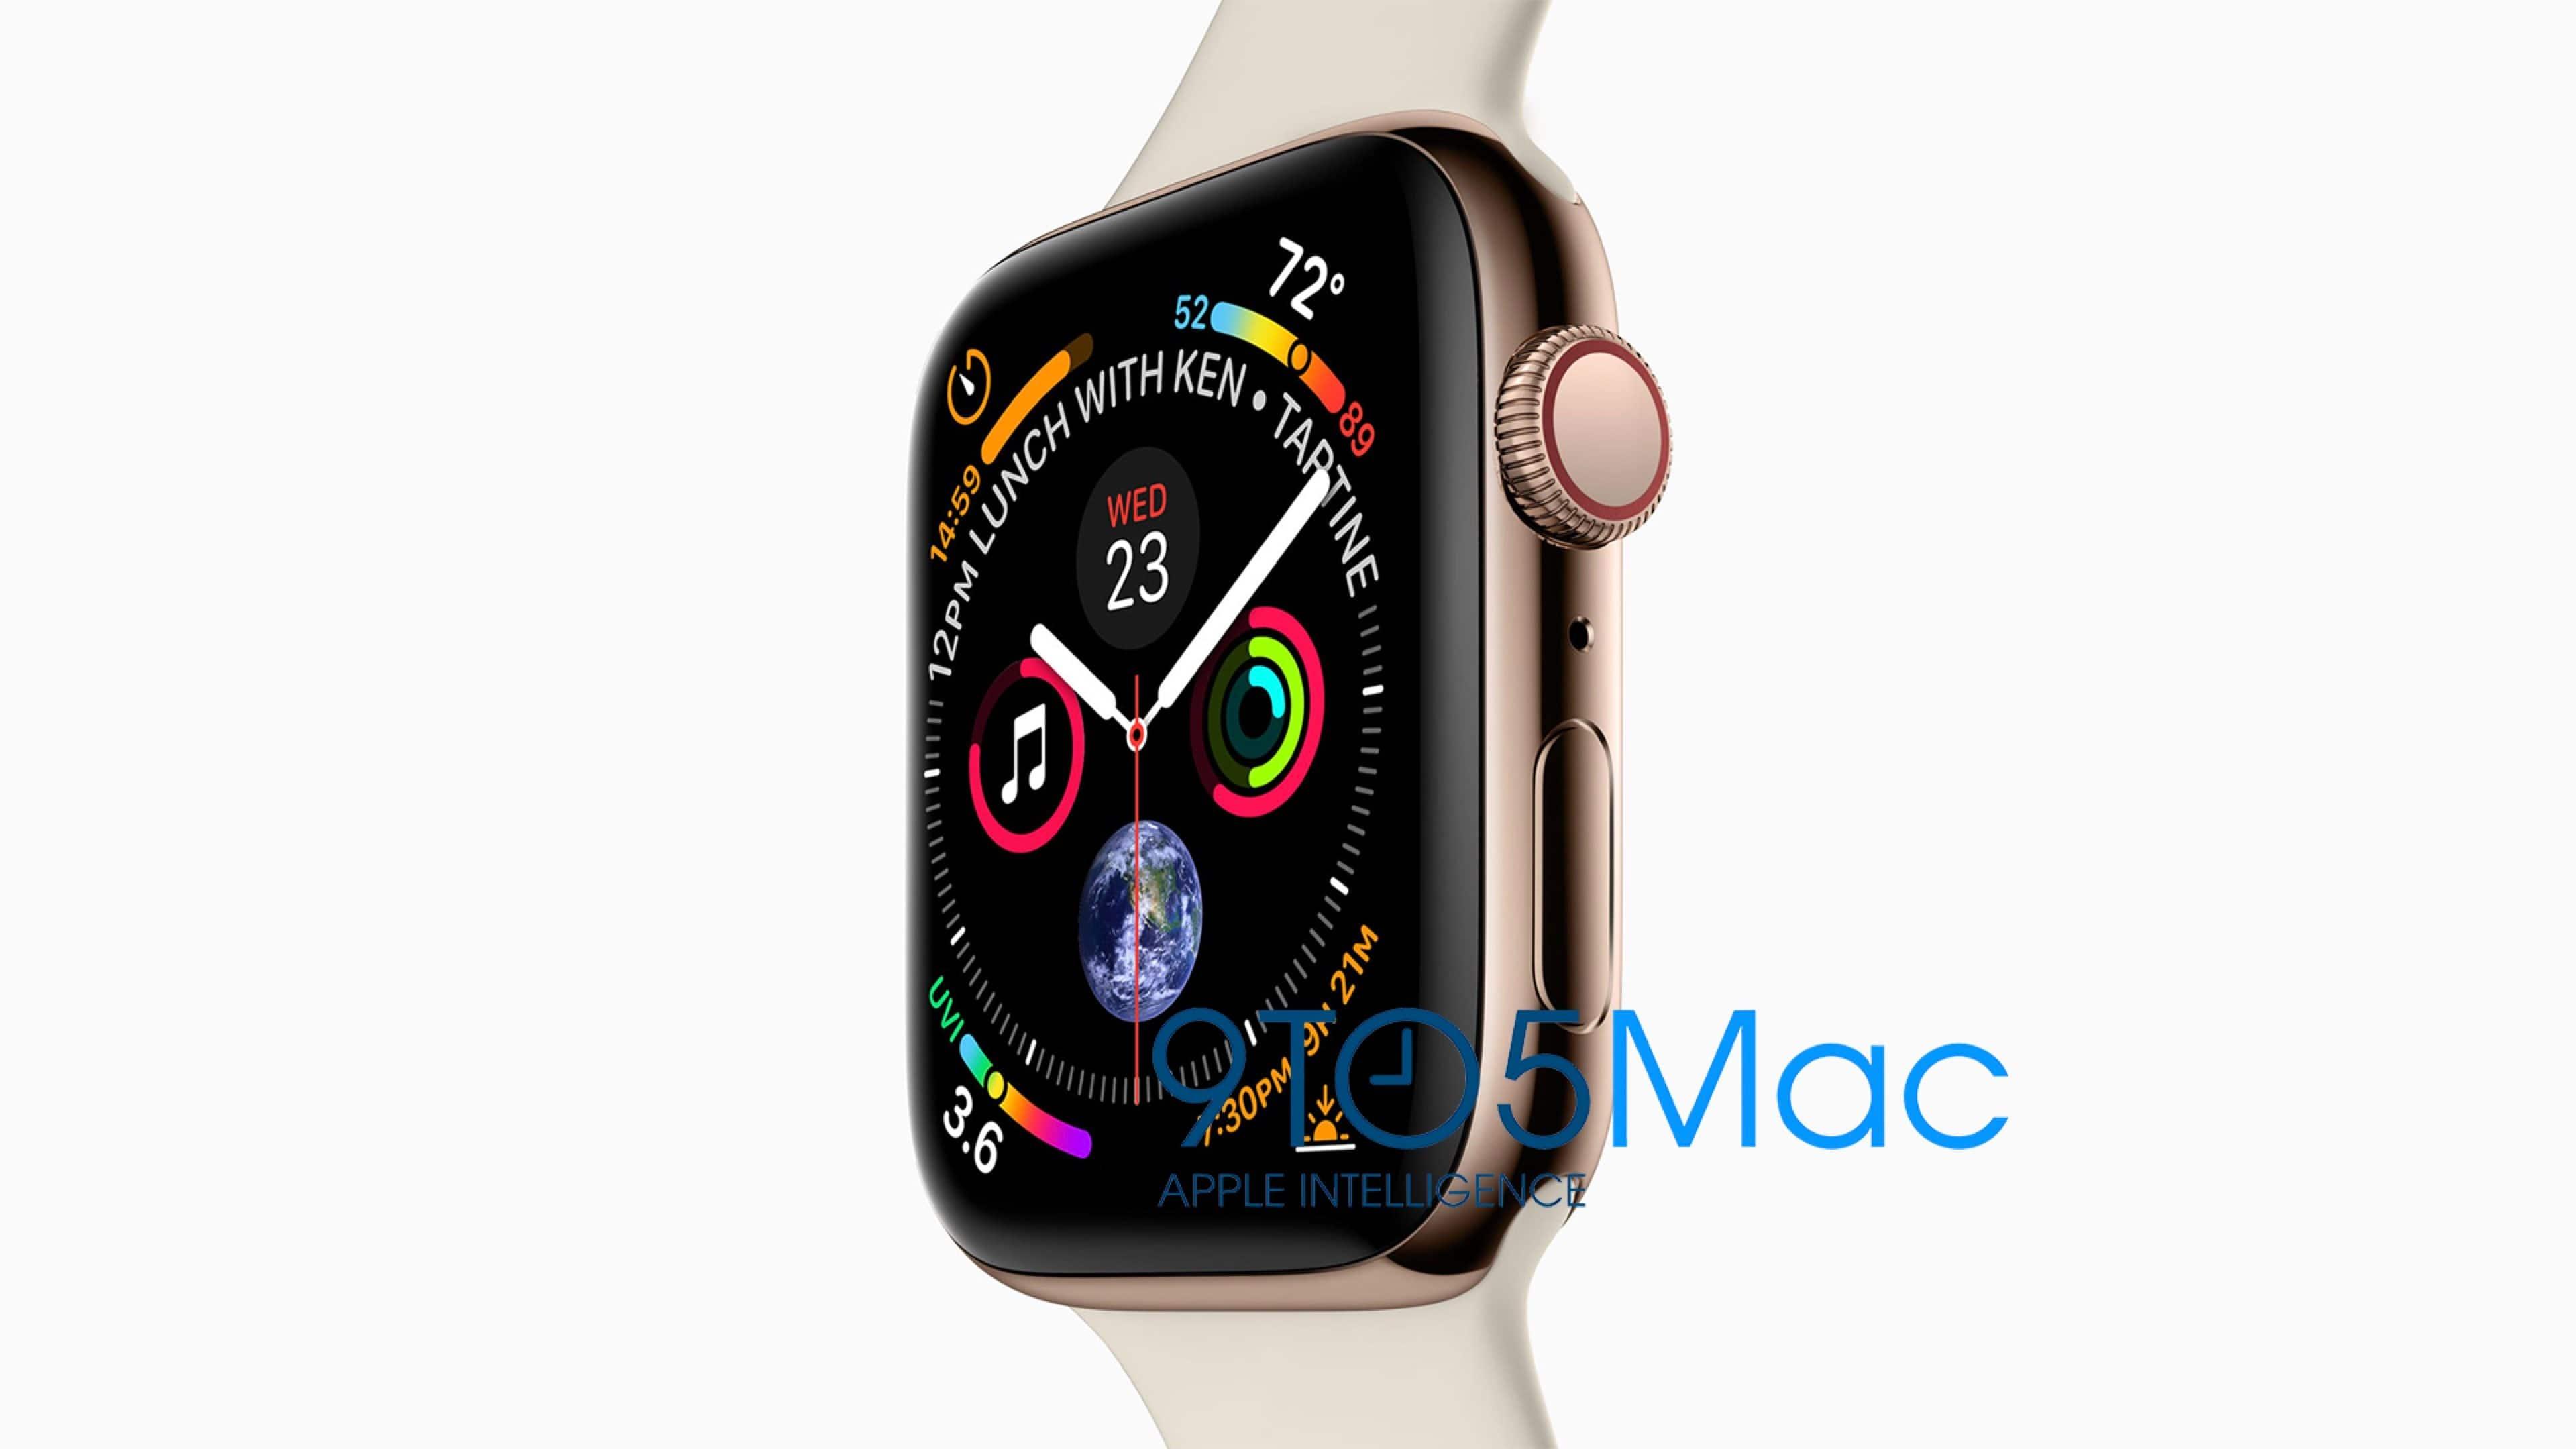 Apple, Apple Watch Series 4, Apple September event, iPhone Xs launch, Apple Watch Series 4 launch, Apple iPhone 2018 lineup, Apple Watch 4 price, iPad Pro 12.9 (2018), Apple Watch 4 launch date